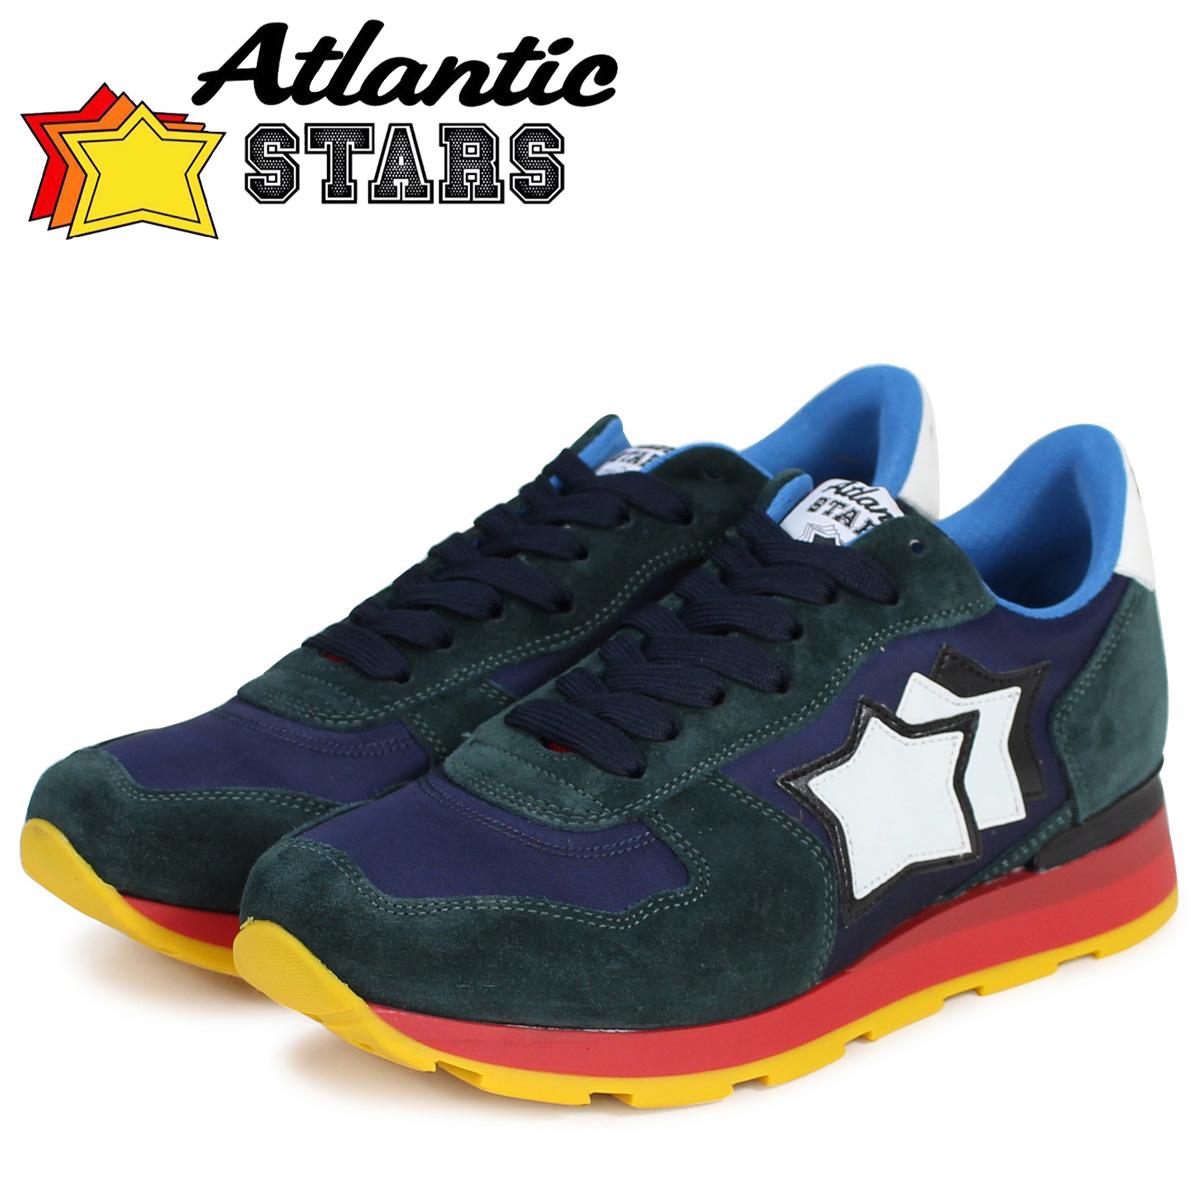 Atlantic STARS メンズ スニーカー アトランティックスターズ アンタレス ANTARES LNR 靴 グリーン ネイビー